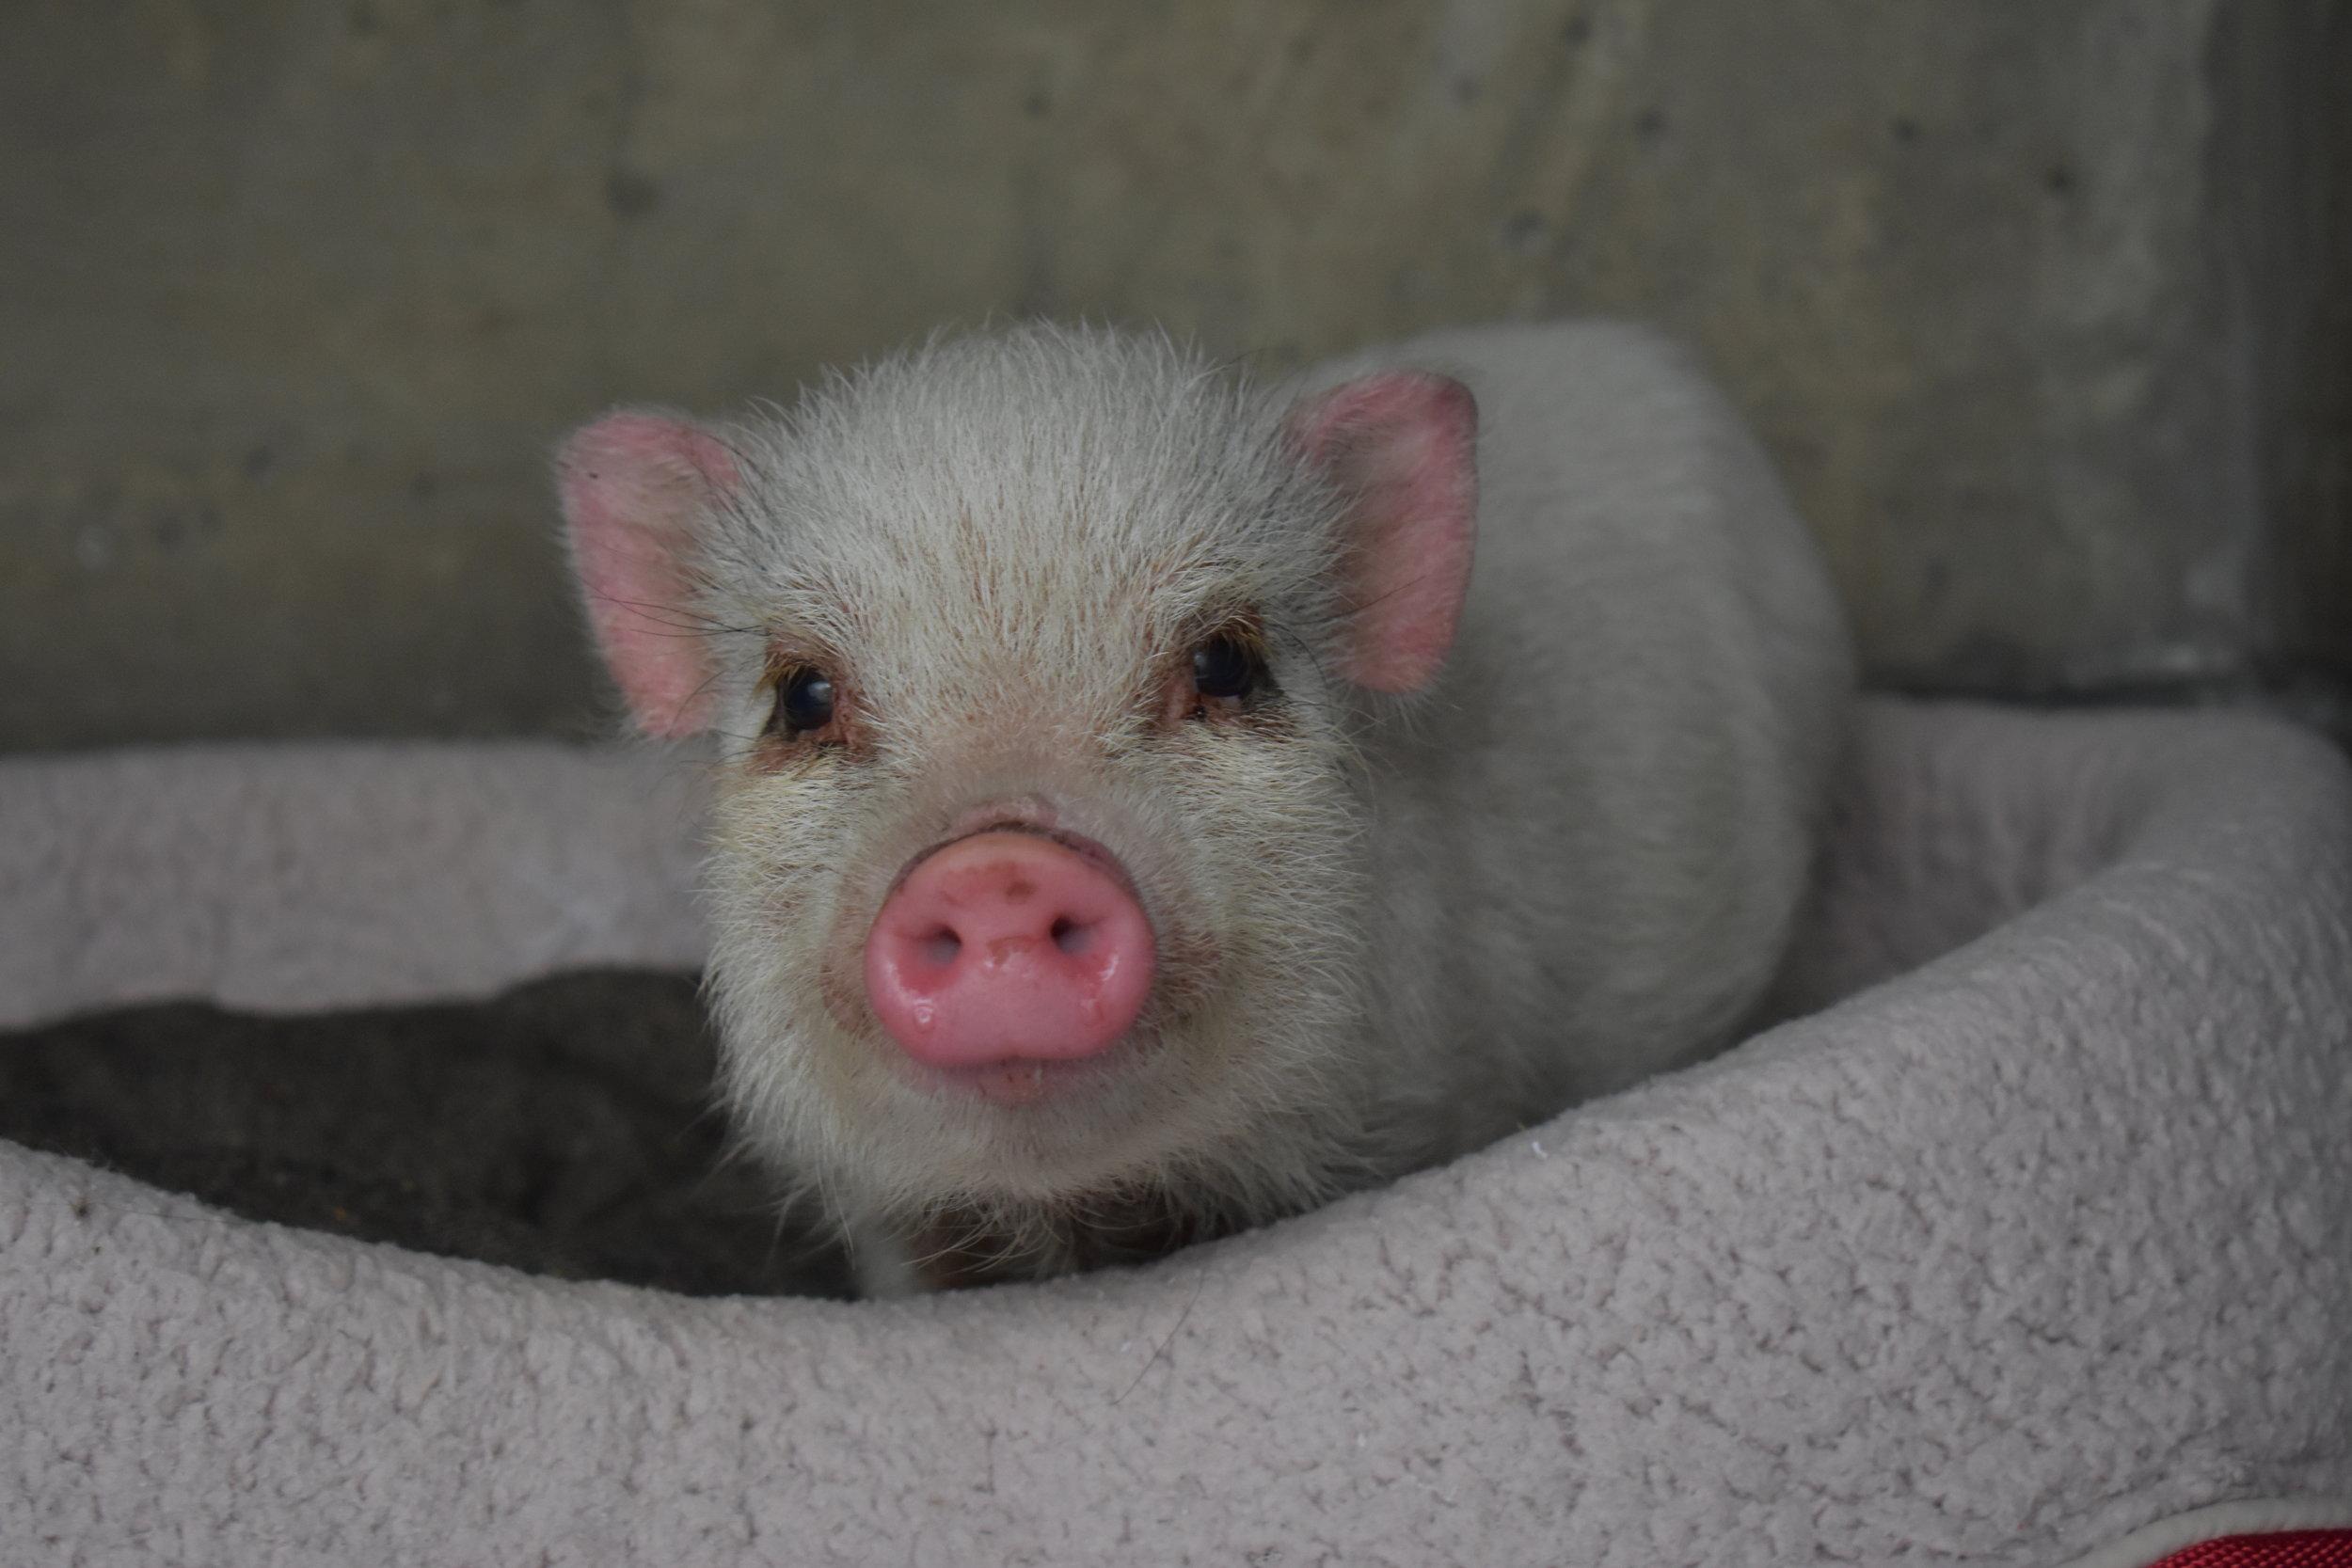 Copy of Pig (A472826) f.JPG